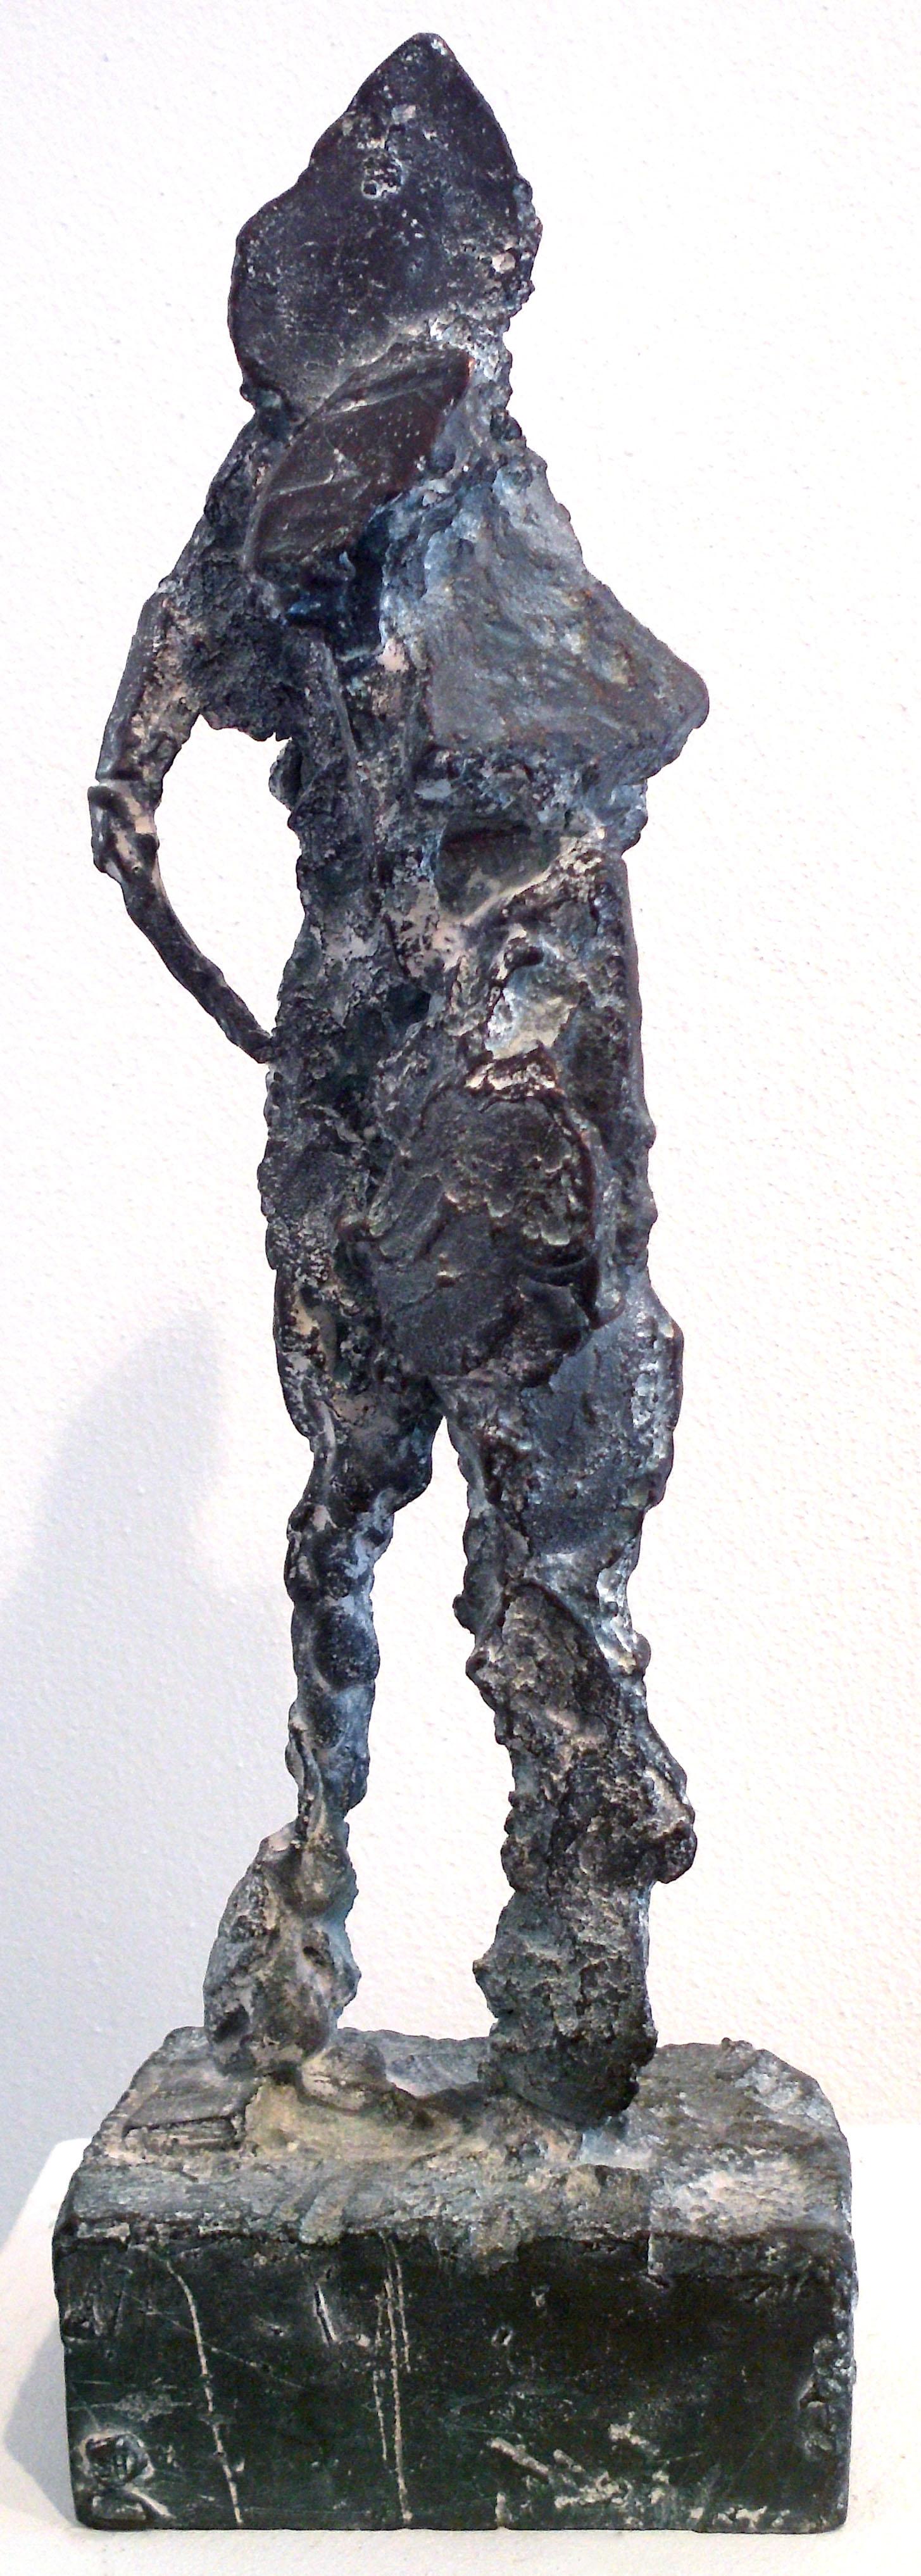 Sylvia Hagen - Lauf der Dinge I | Bronze | 2004